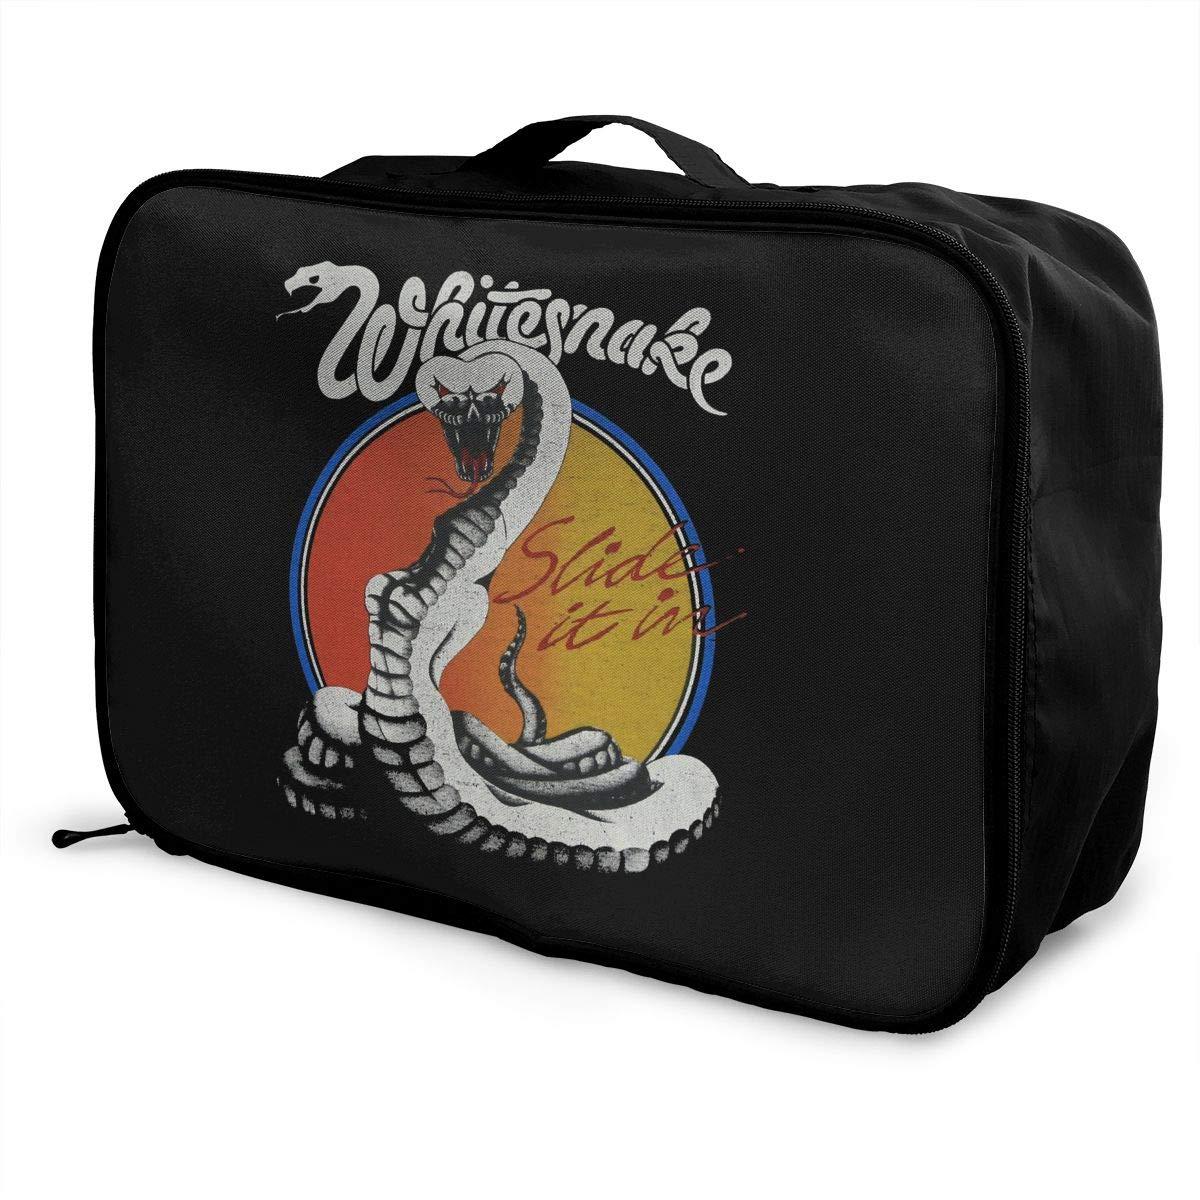 Fretlo Whitesnake-Slide-It-In-Tour-Concert Travel Duffel Bag Waterproof Lightweight Large Capacity Portable Luggage Bag Black